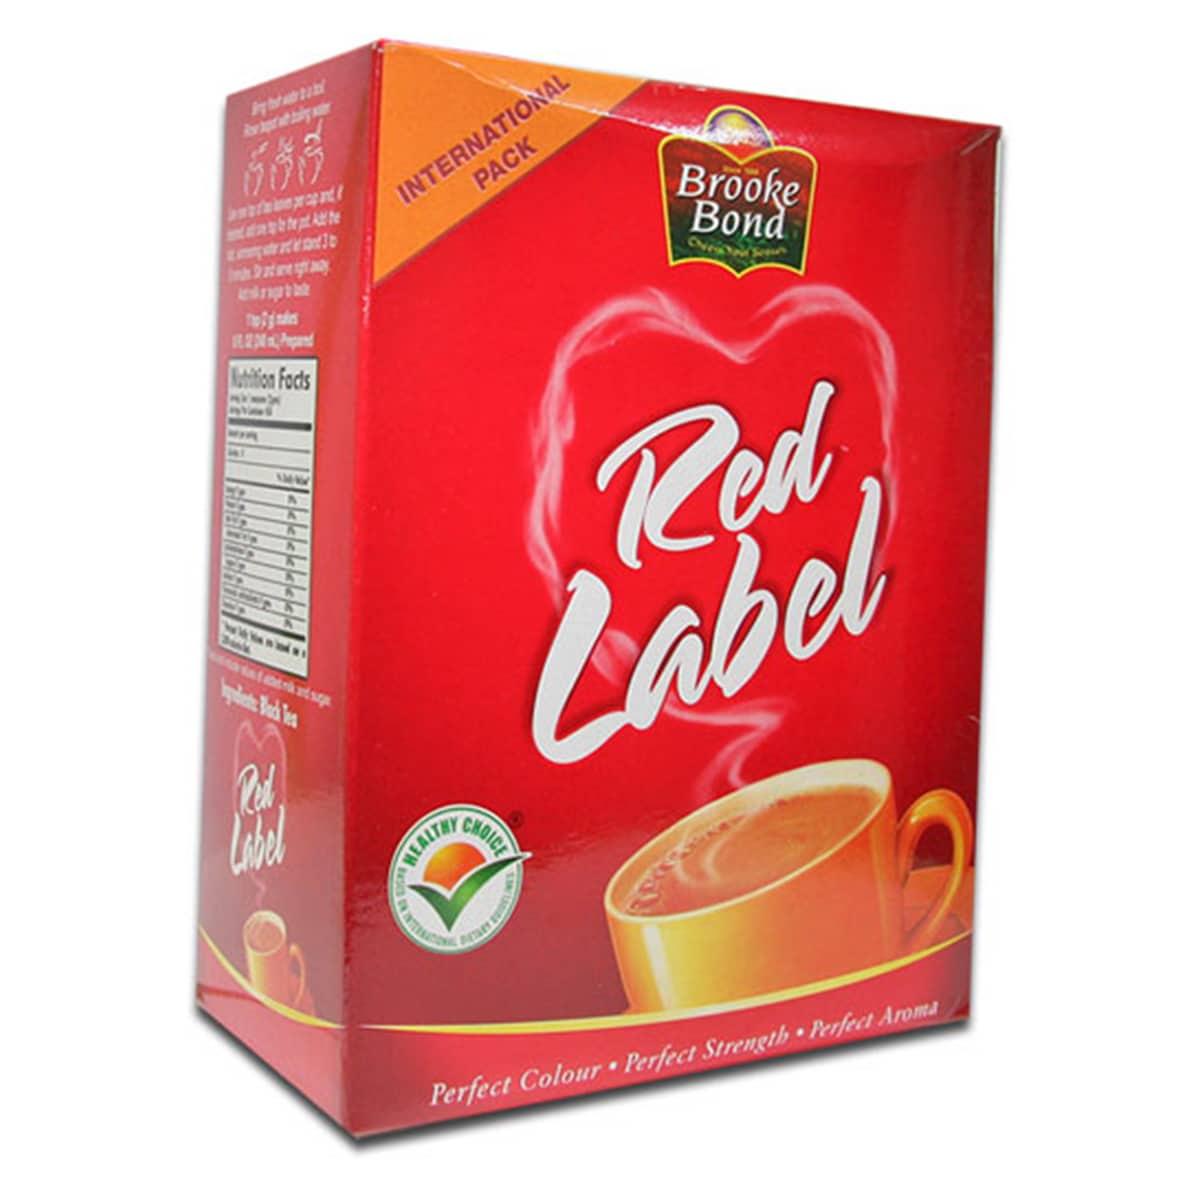 Buy Brooke Bond Red Label Tea (Loose Tea) - 900 gm